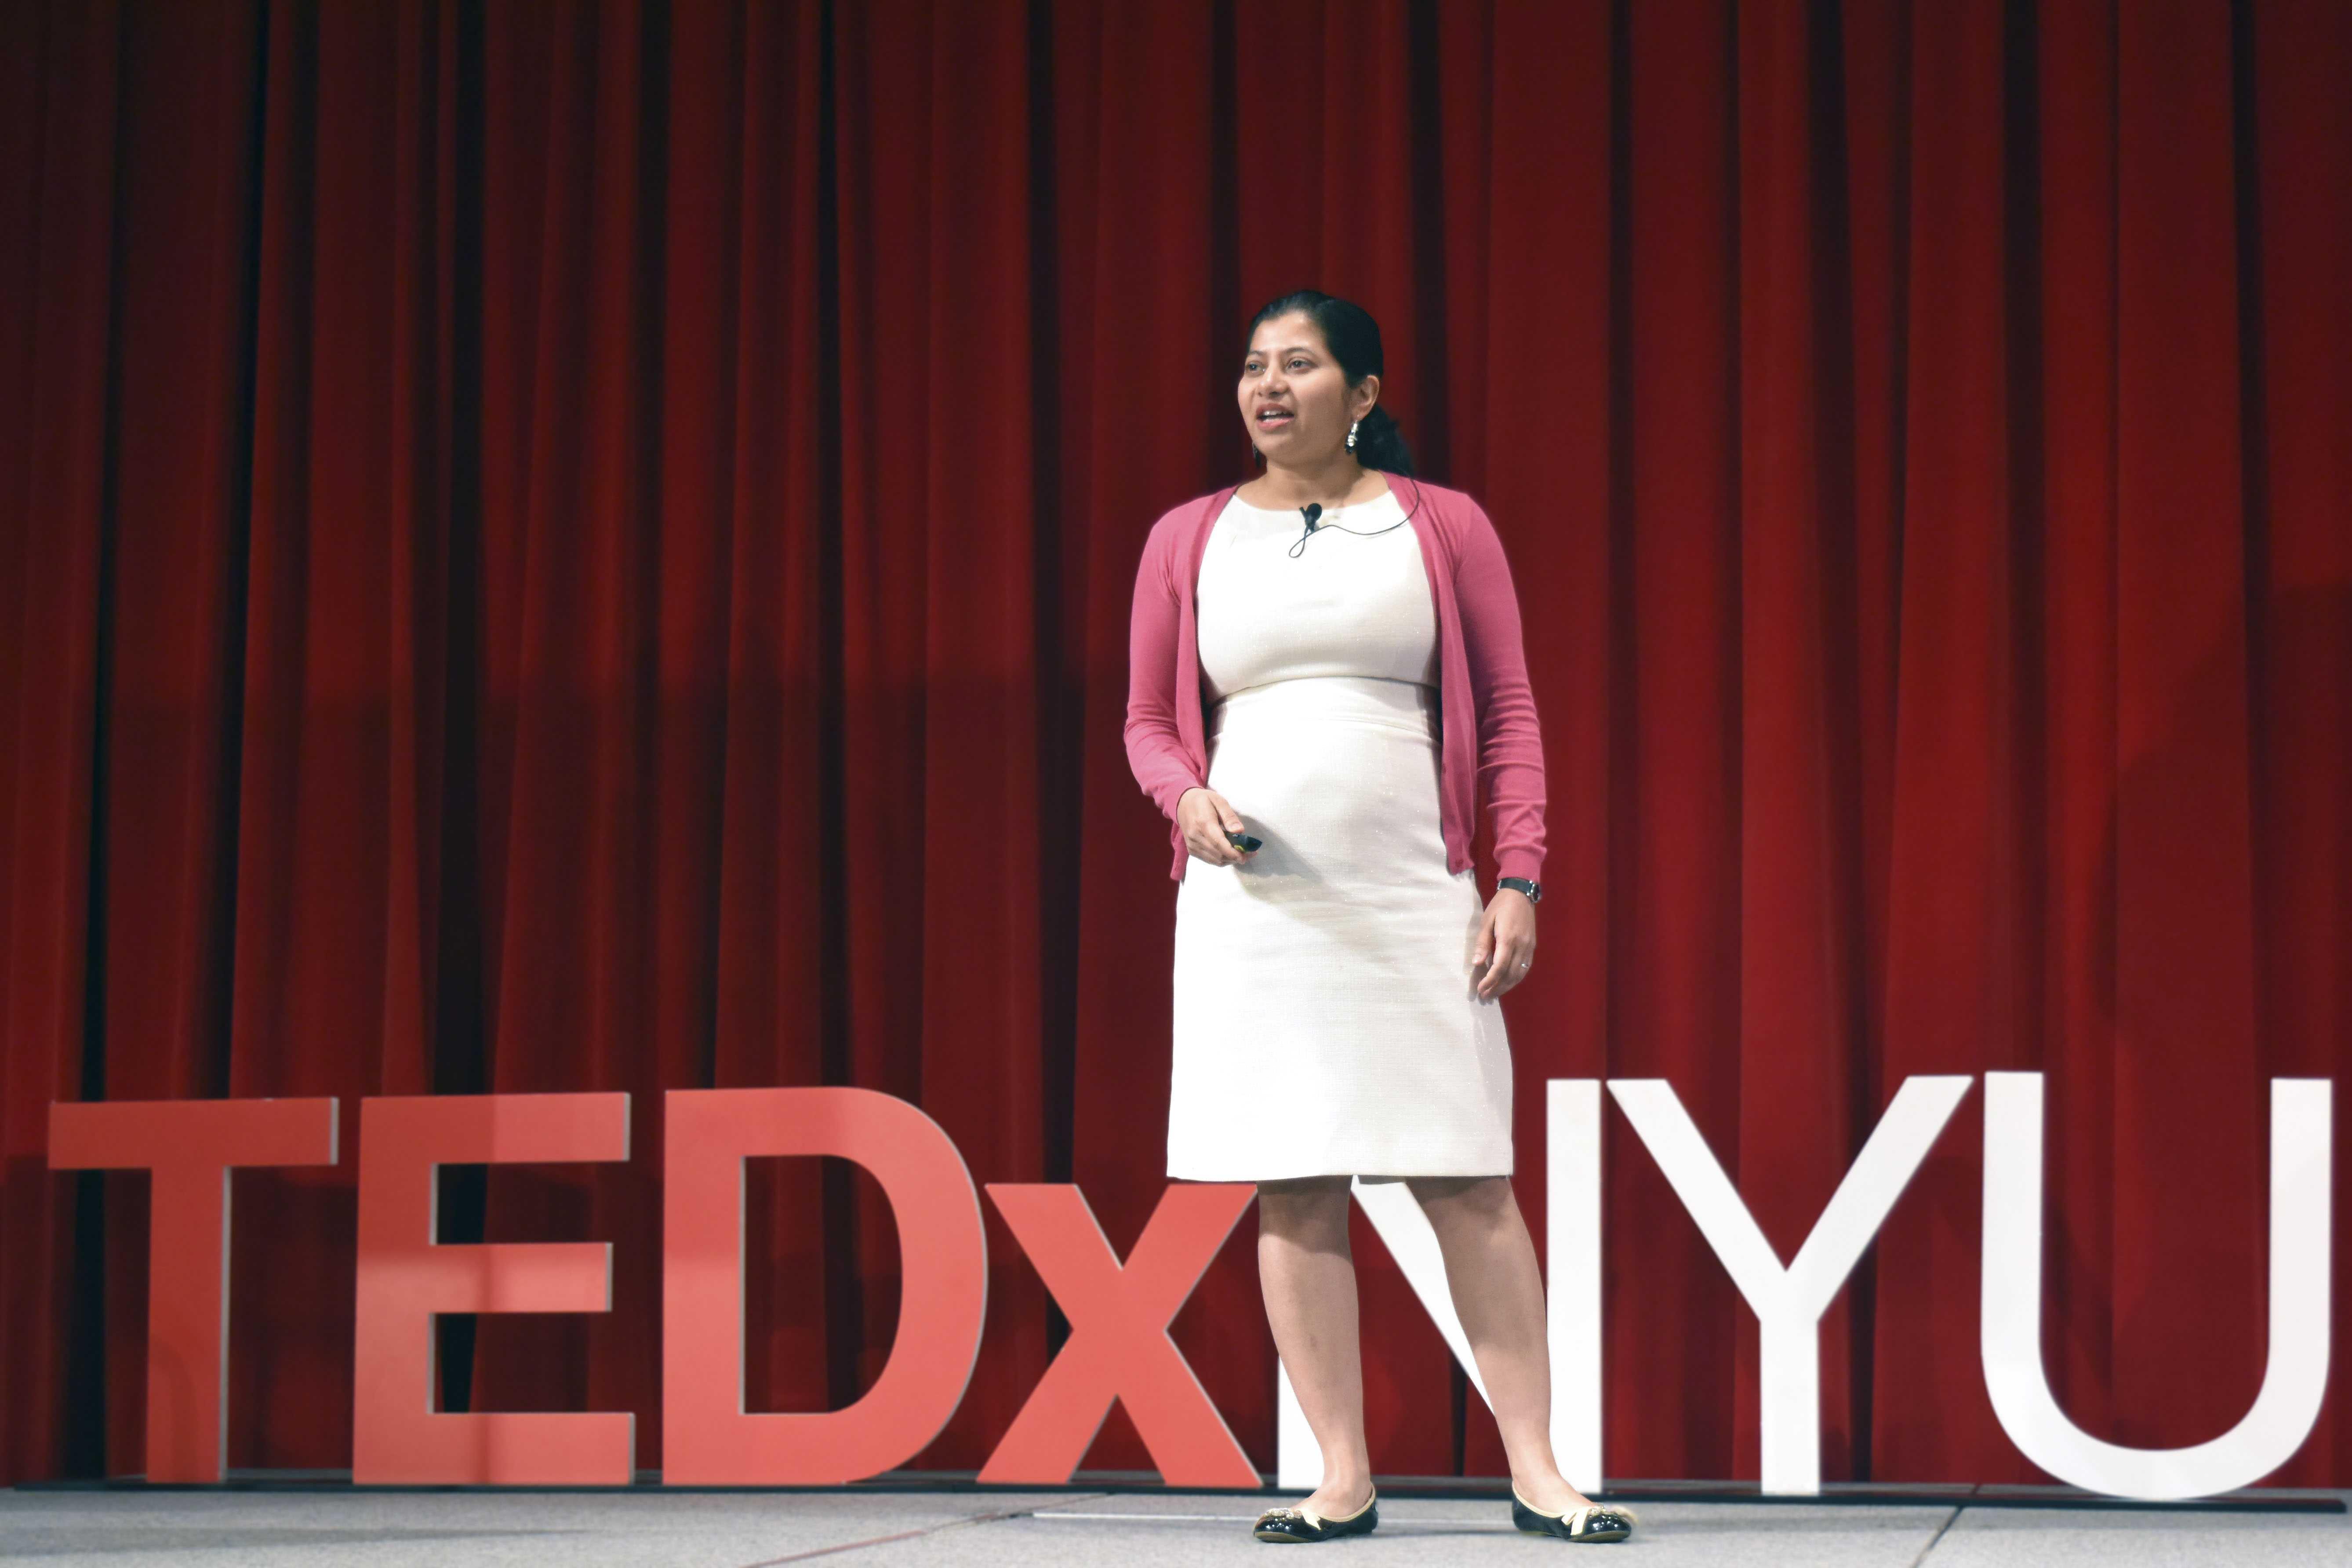 NYU Assistant Professor  Jayeeta Basu spoke about neuroscience at the TEDxNYU conference on April 8.